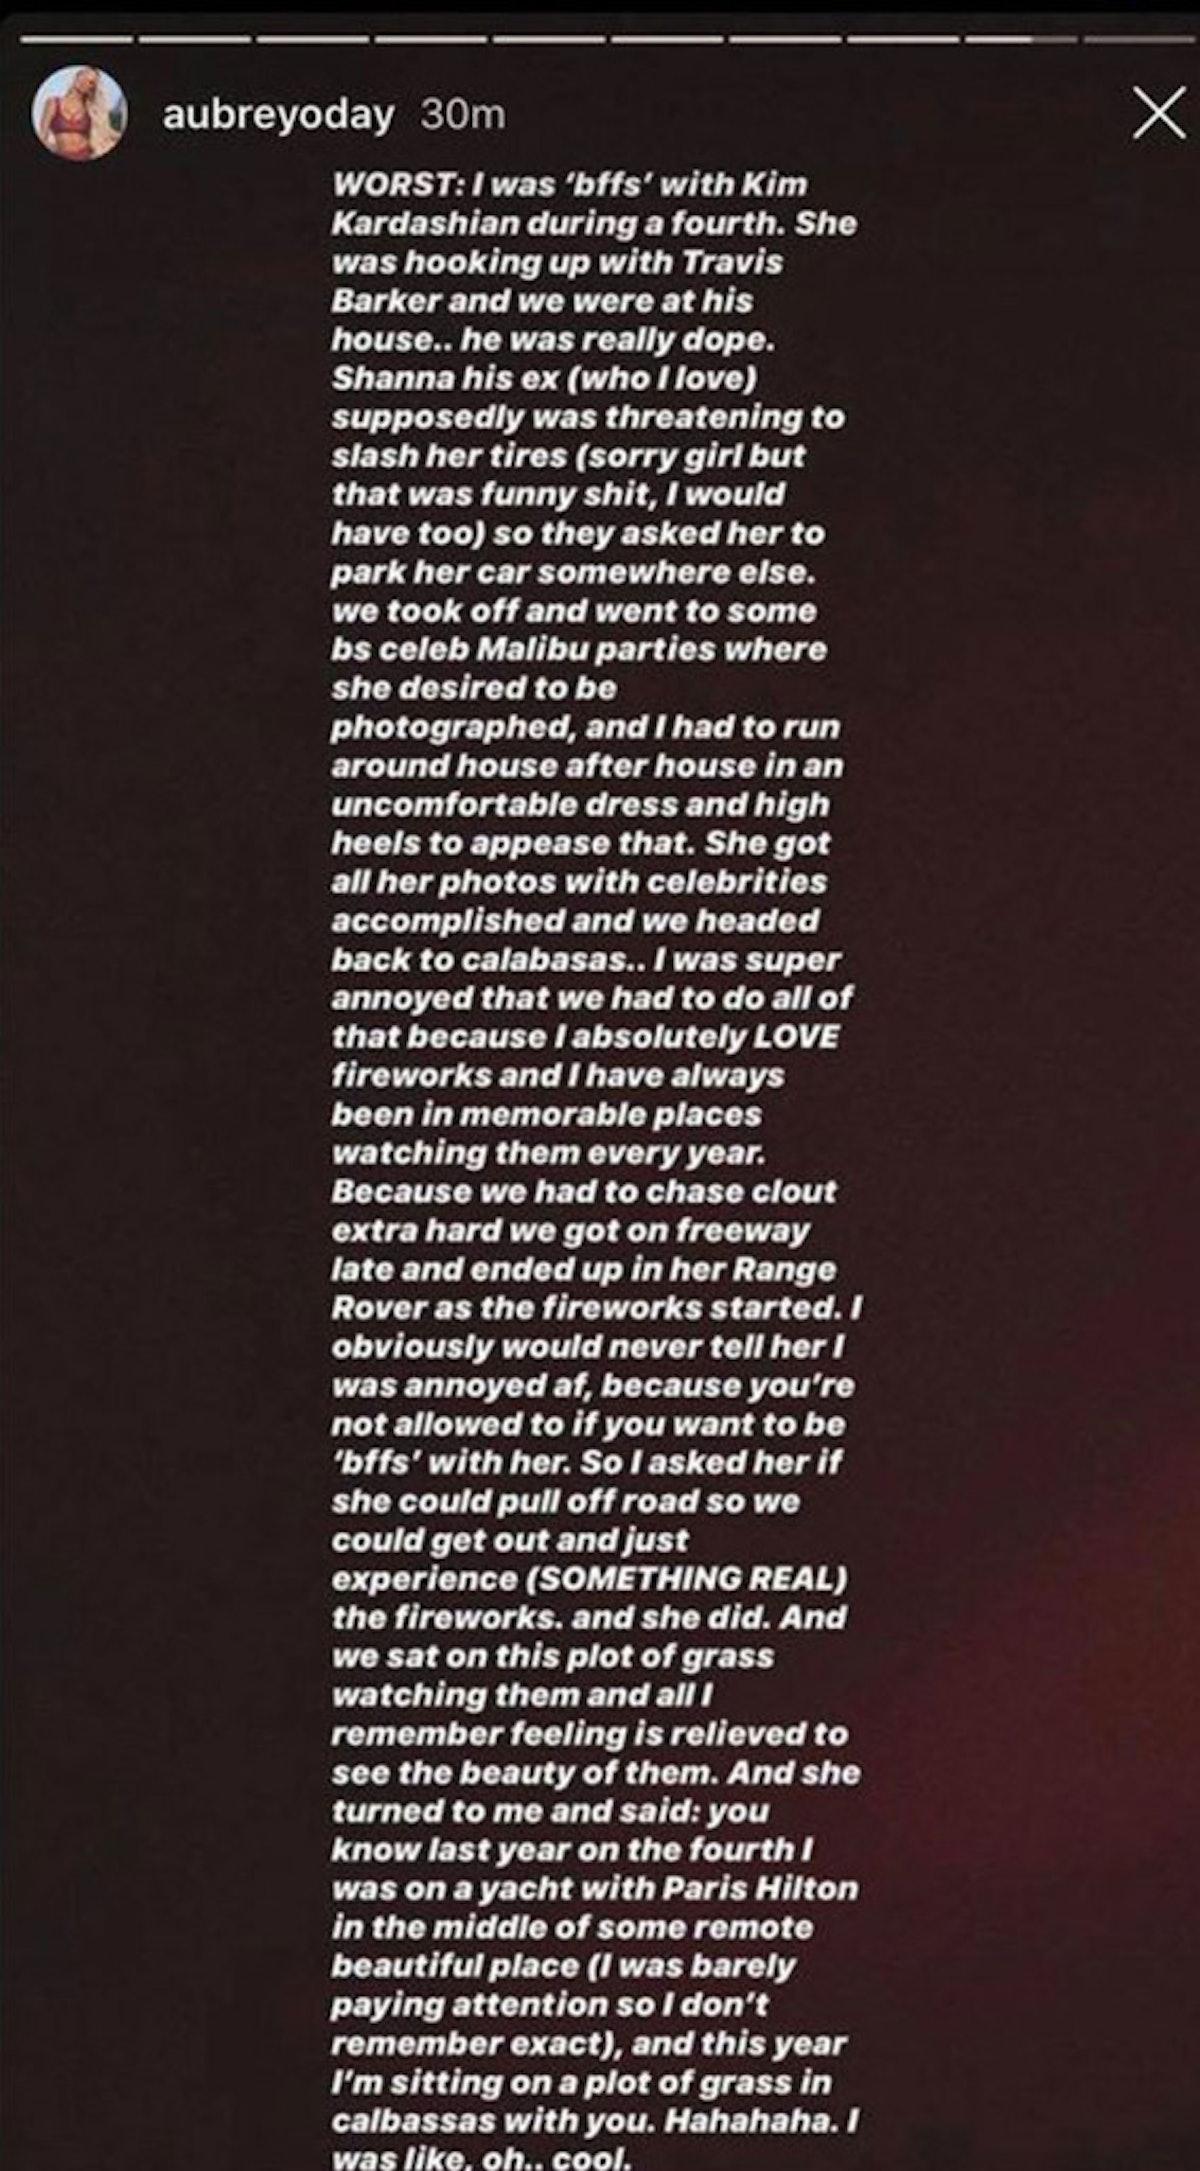 Aubrey O'Day claims Kim Kardashian and Travis Barker hooked up.